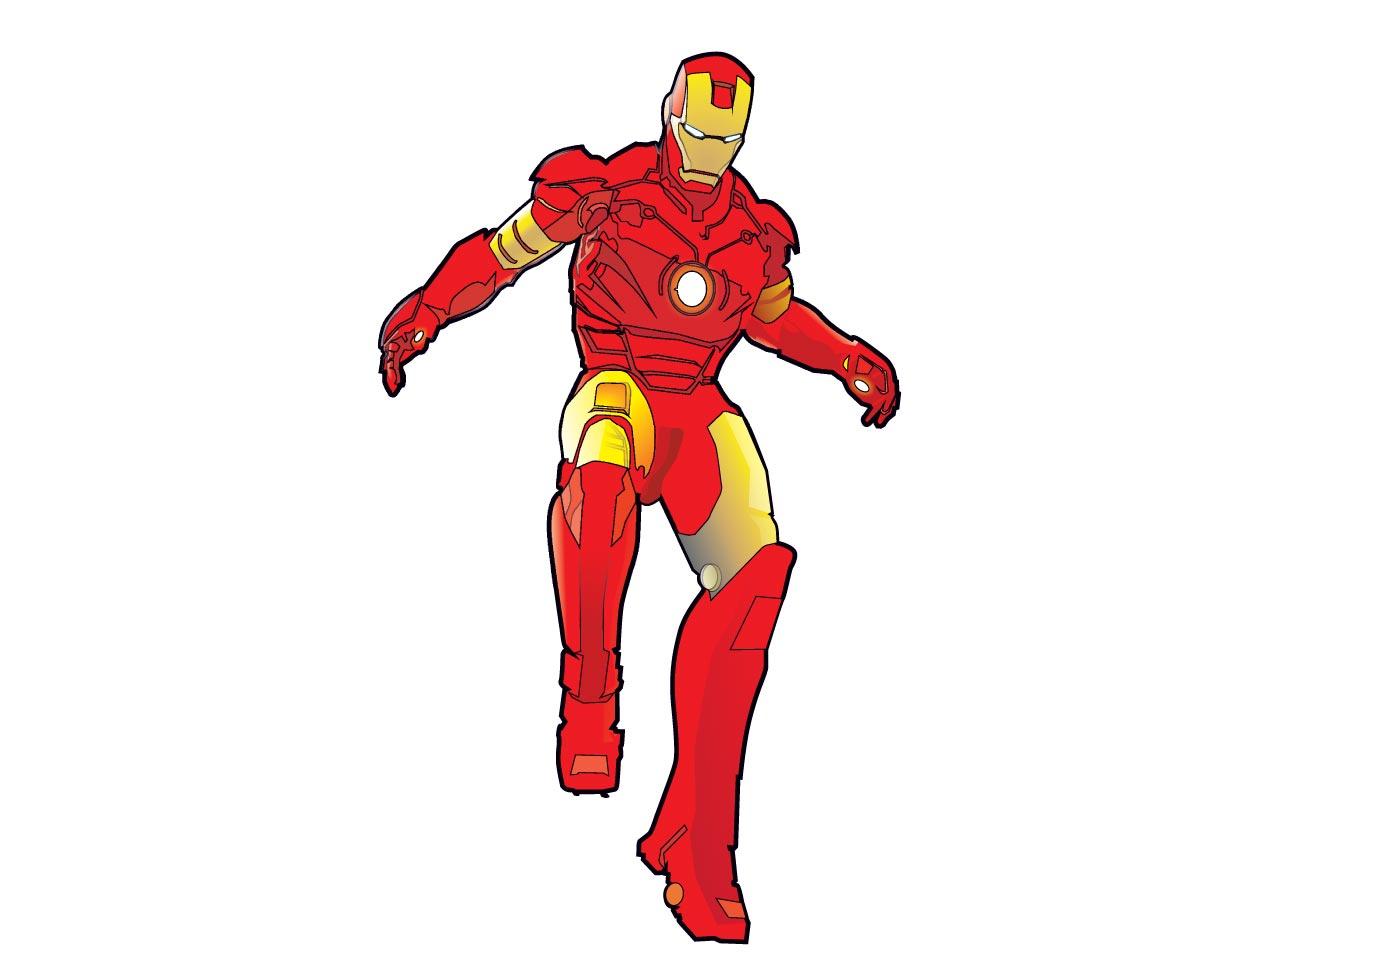 Iron man vector download free vectors clipart graphics - Iron man cartoon download ...